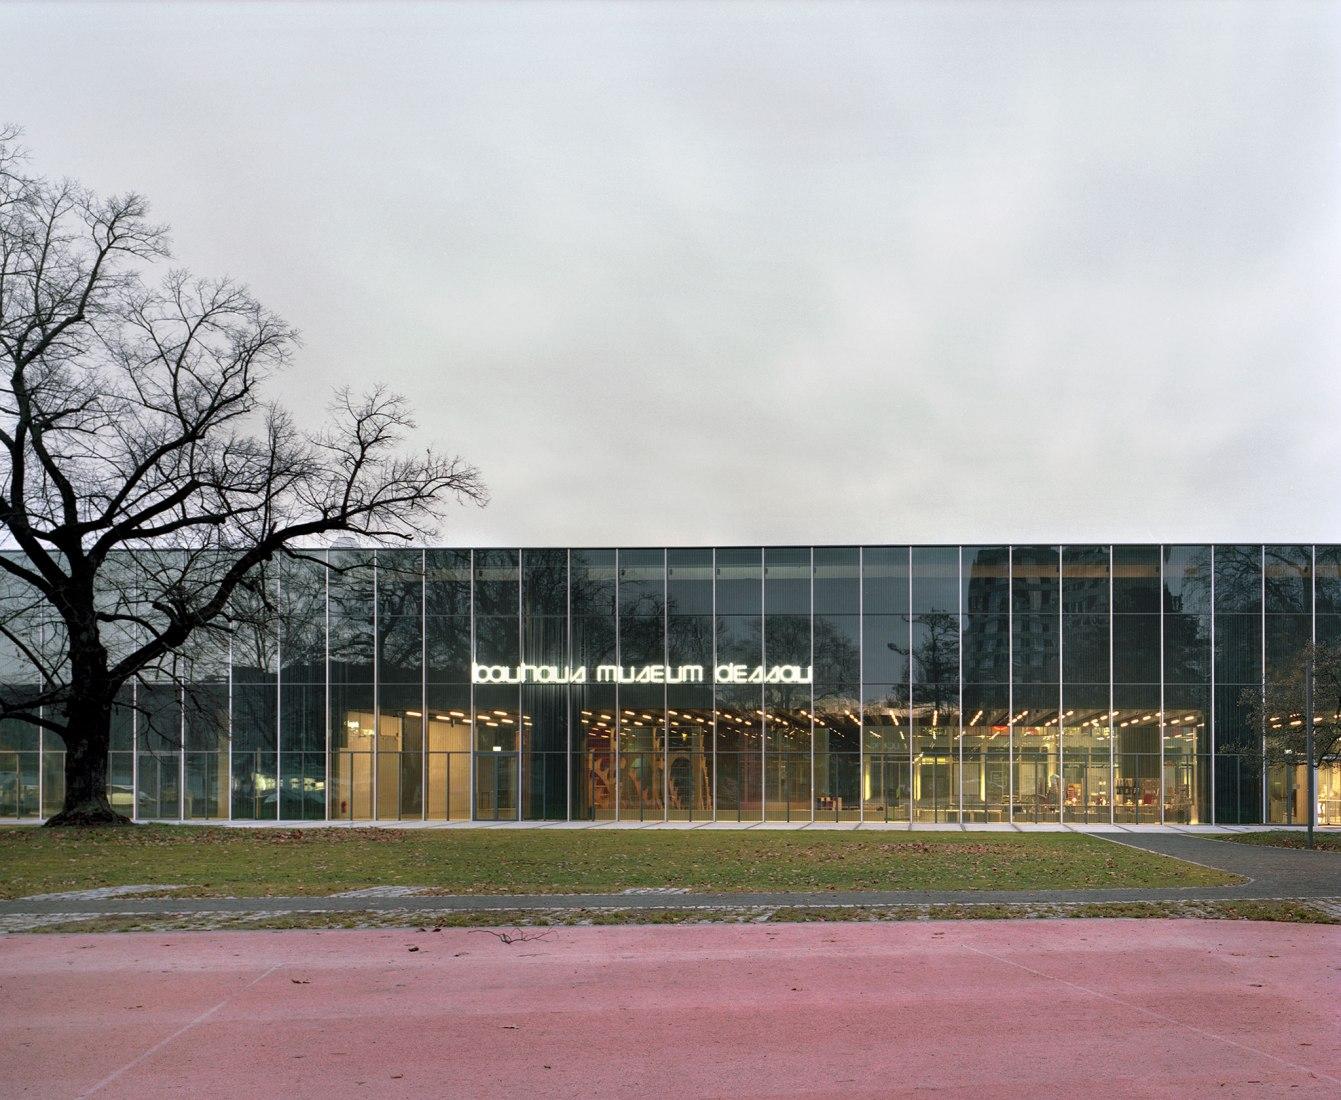 Bauhaus Museum Dessau por Addenda Architects. Fotografía por Maxime Delvaux.